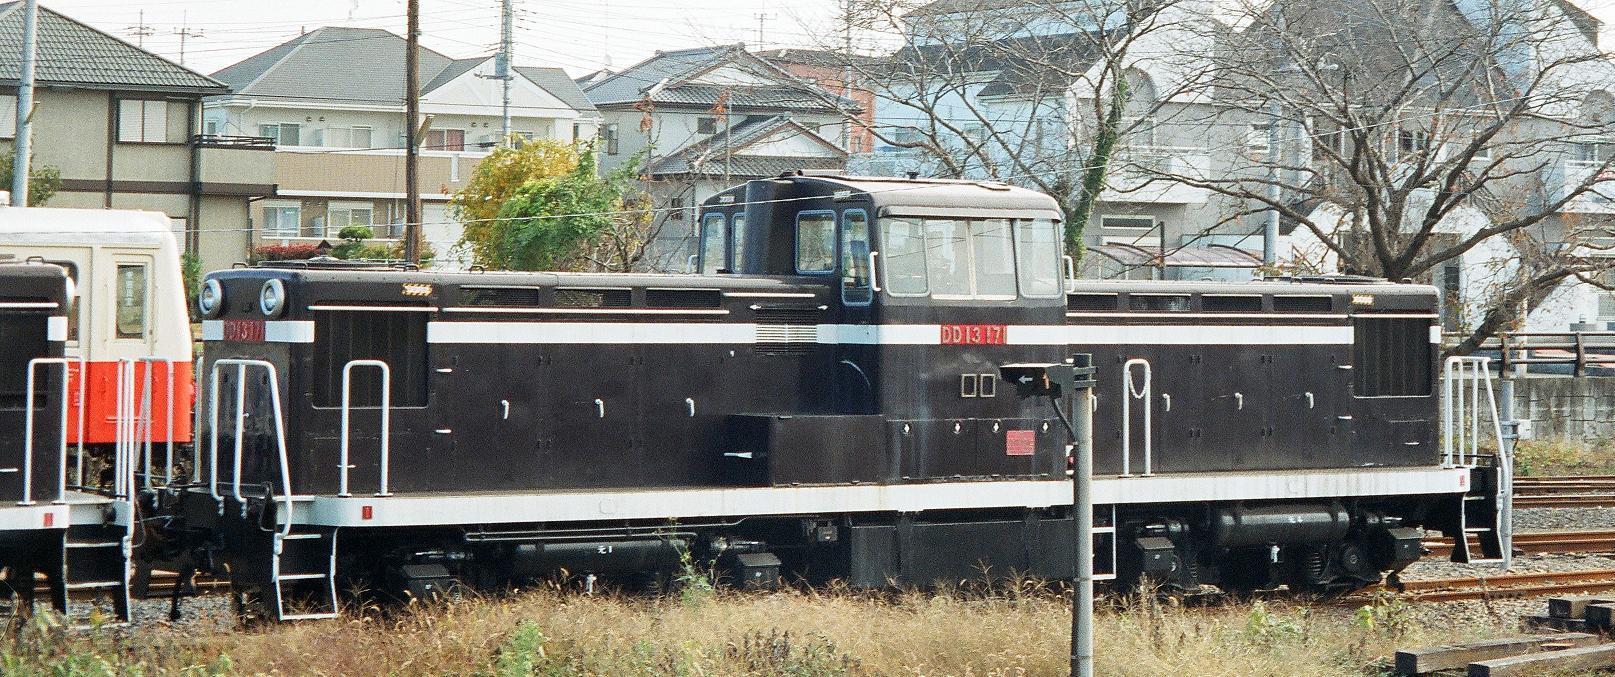 Vehicle - Rail - Locomotive - Diesel - JNR Class DD13